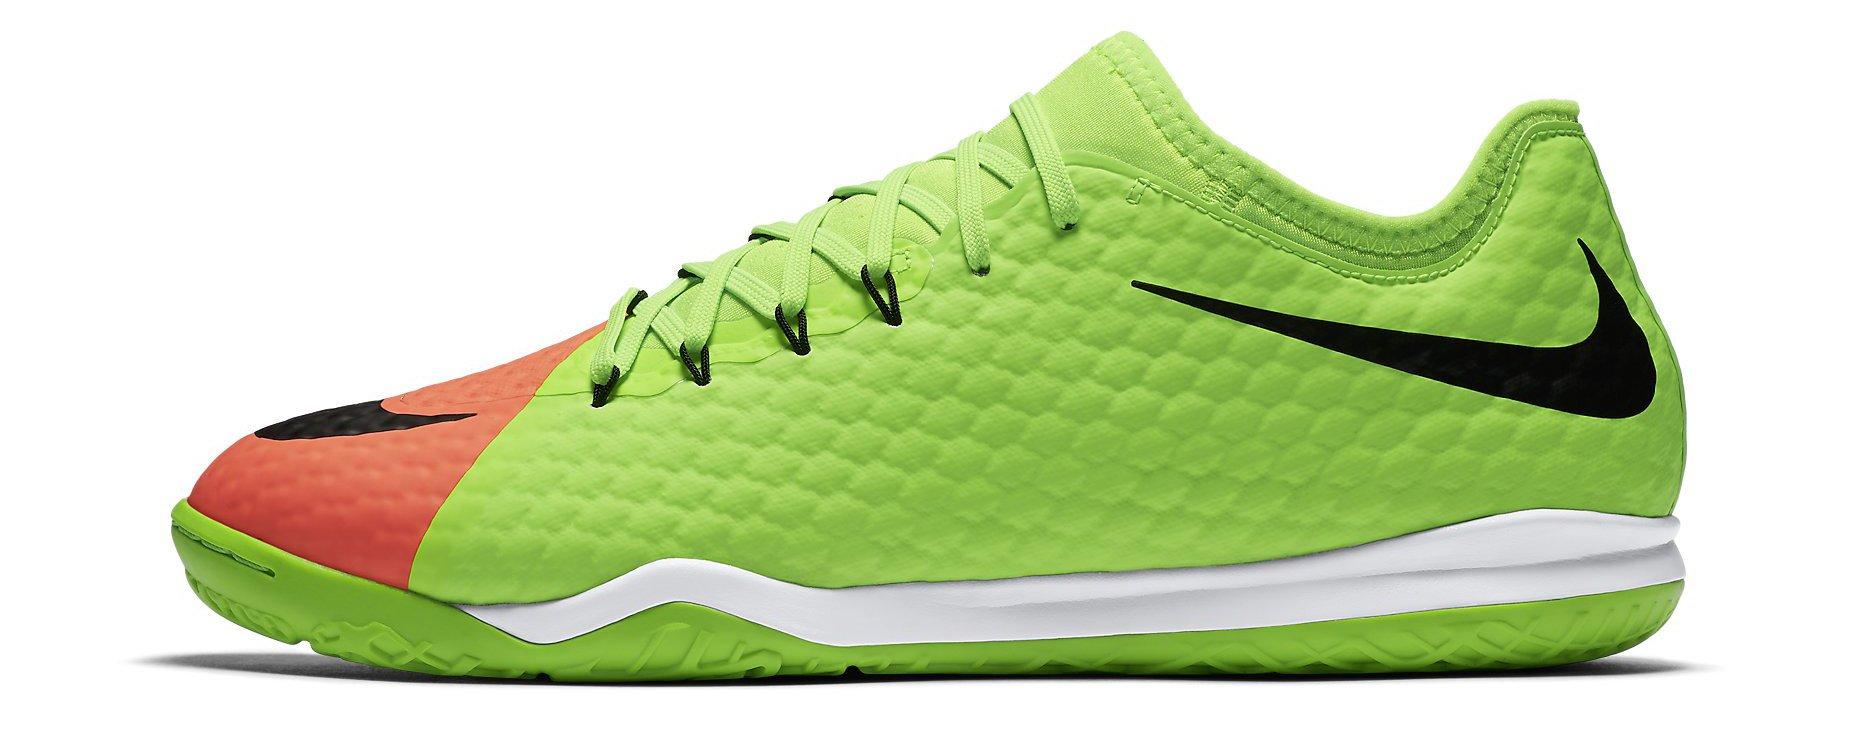 Indoorcourt shoes Nike HYPERVENOMX FINALE II IC